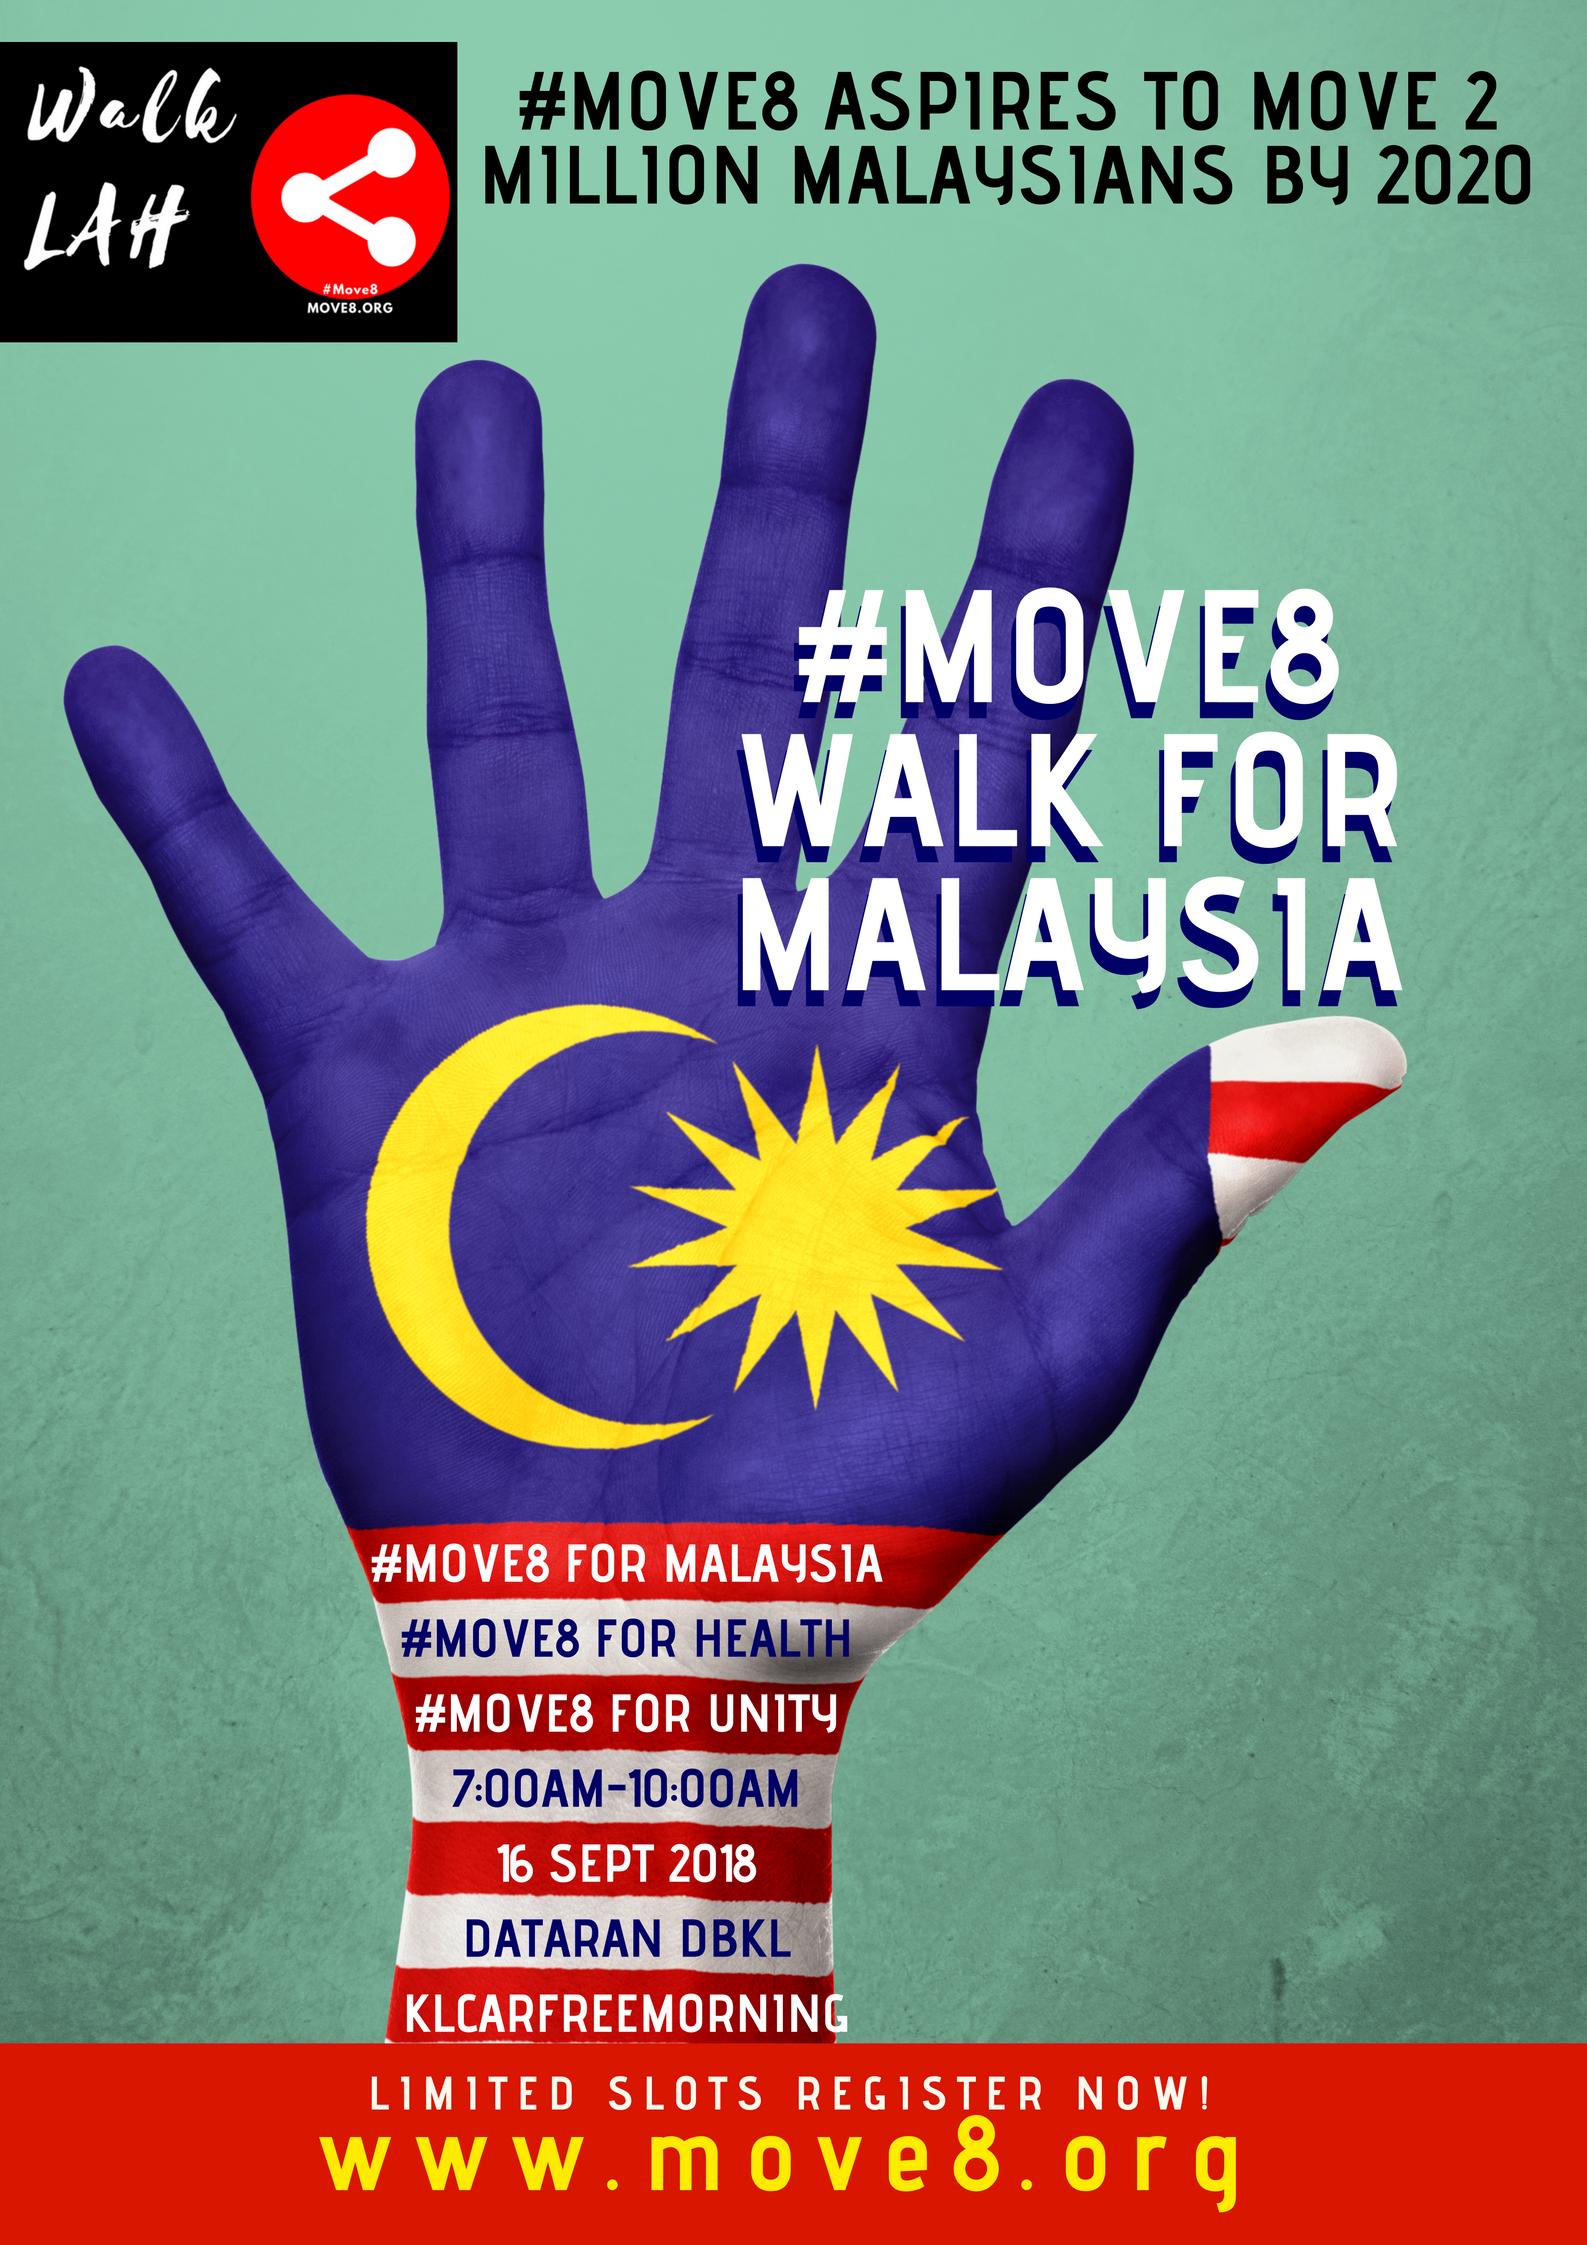 #Move8 for Malaysia Day Walkathon